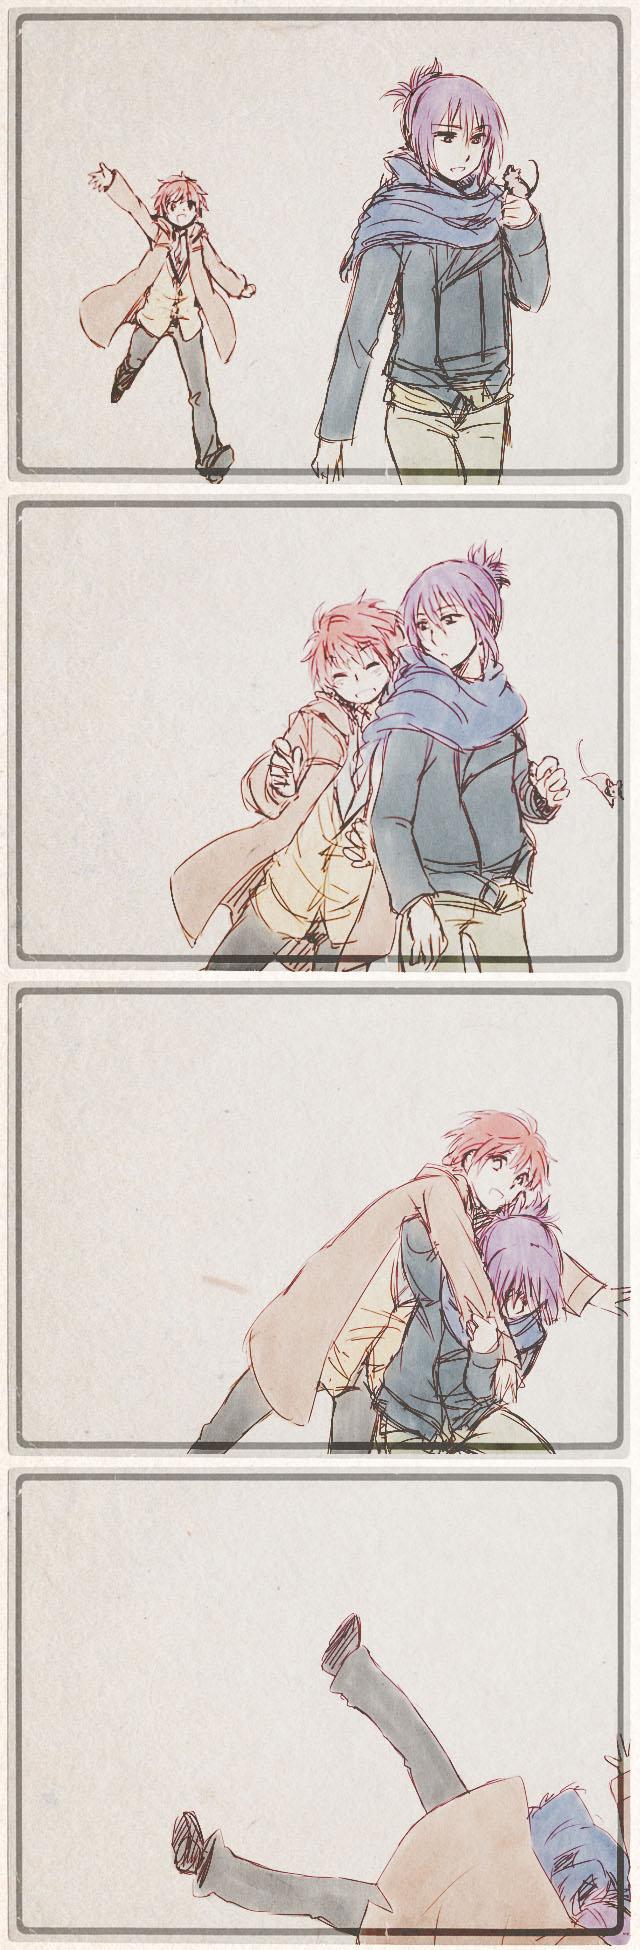 Tags: Anime, Pixiv Id 1519309, No.6, Shion (No.6), Nezumi (No.6), Pixiv, Comic, NezuShi